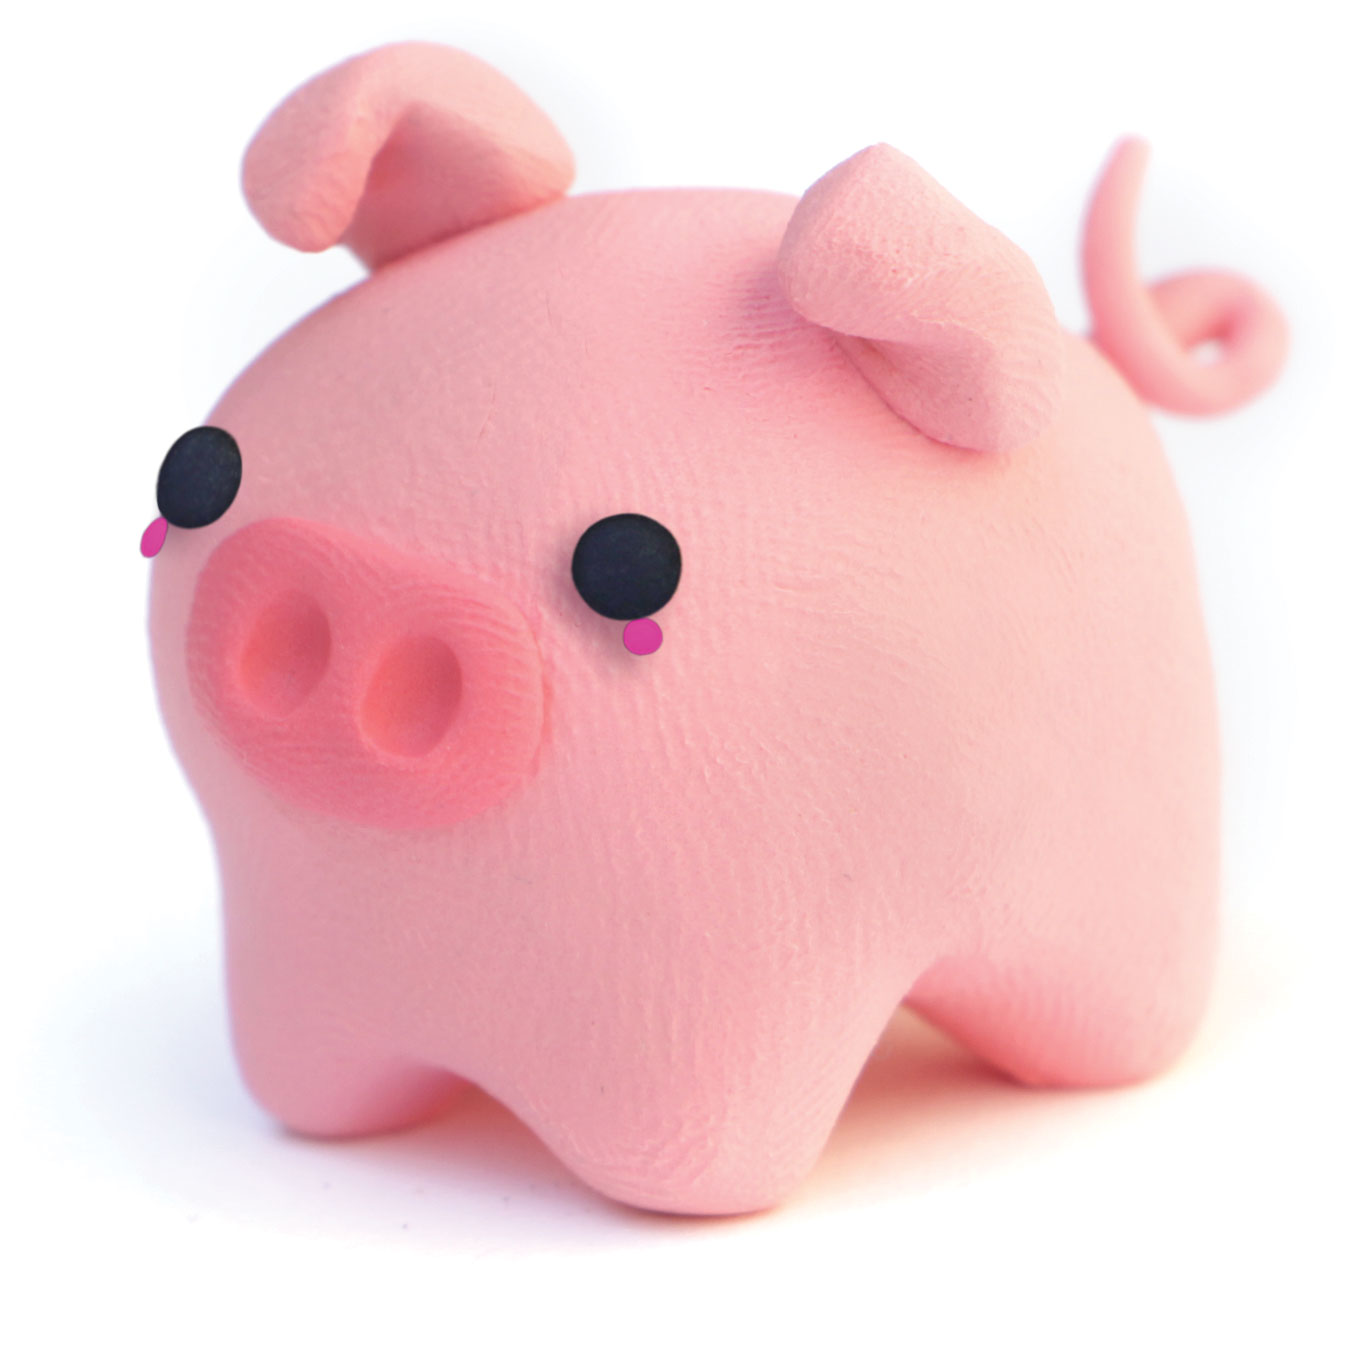 IMAGE-5---Pig.jpg